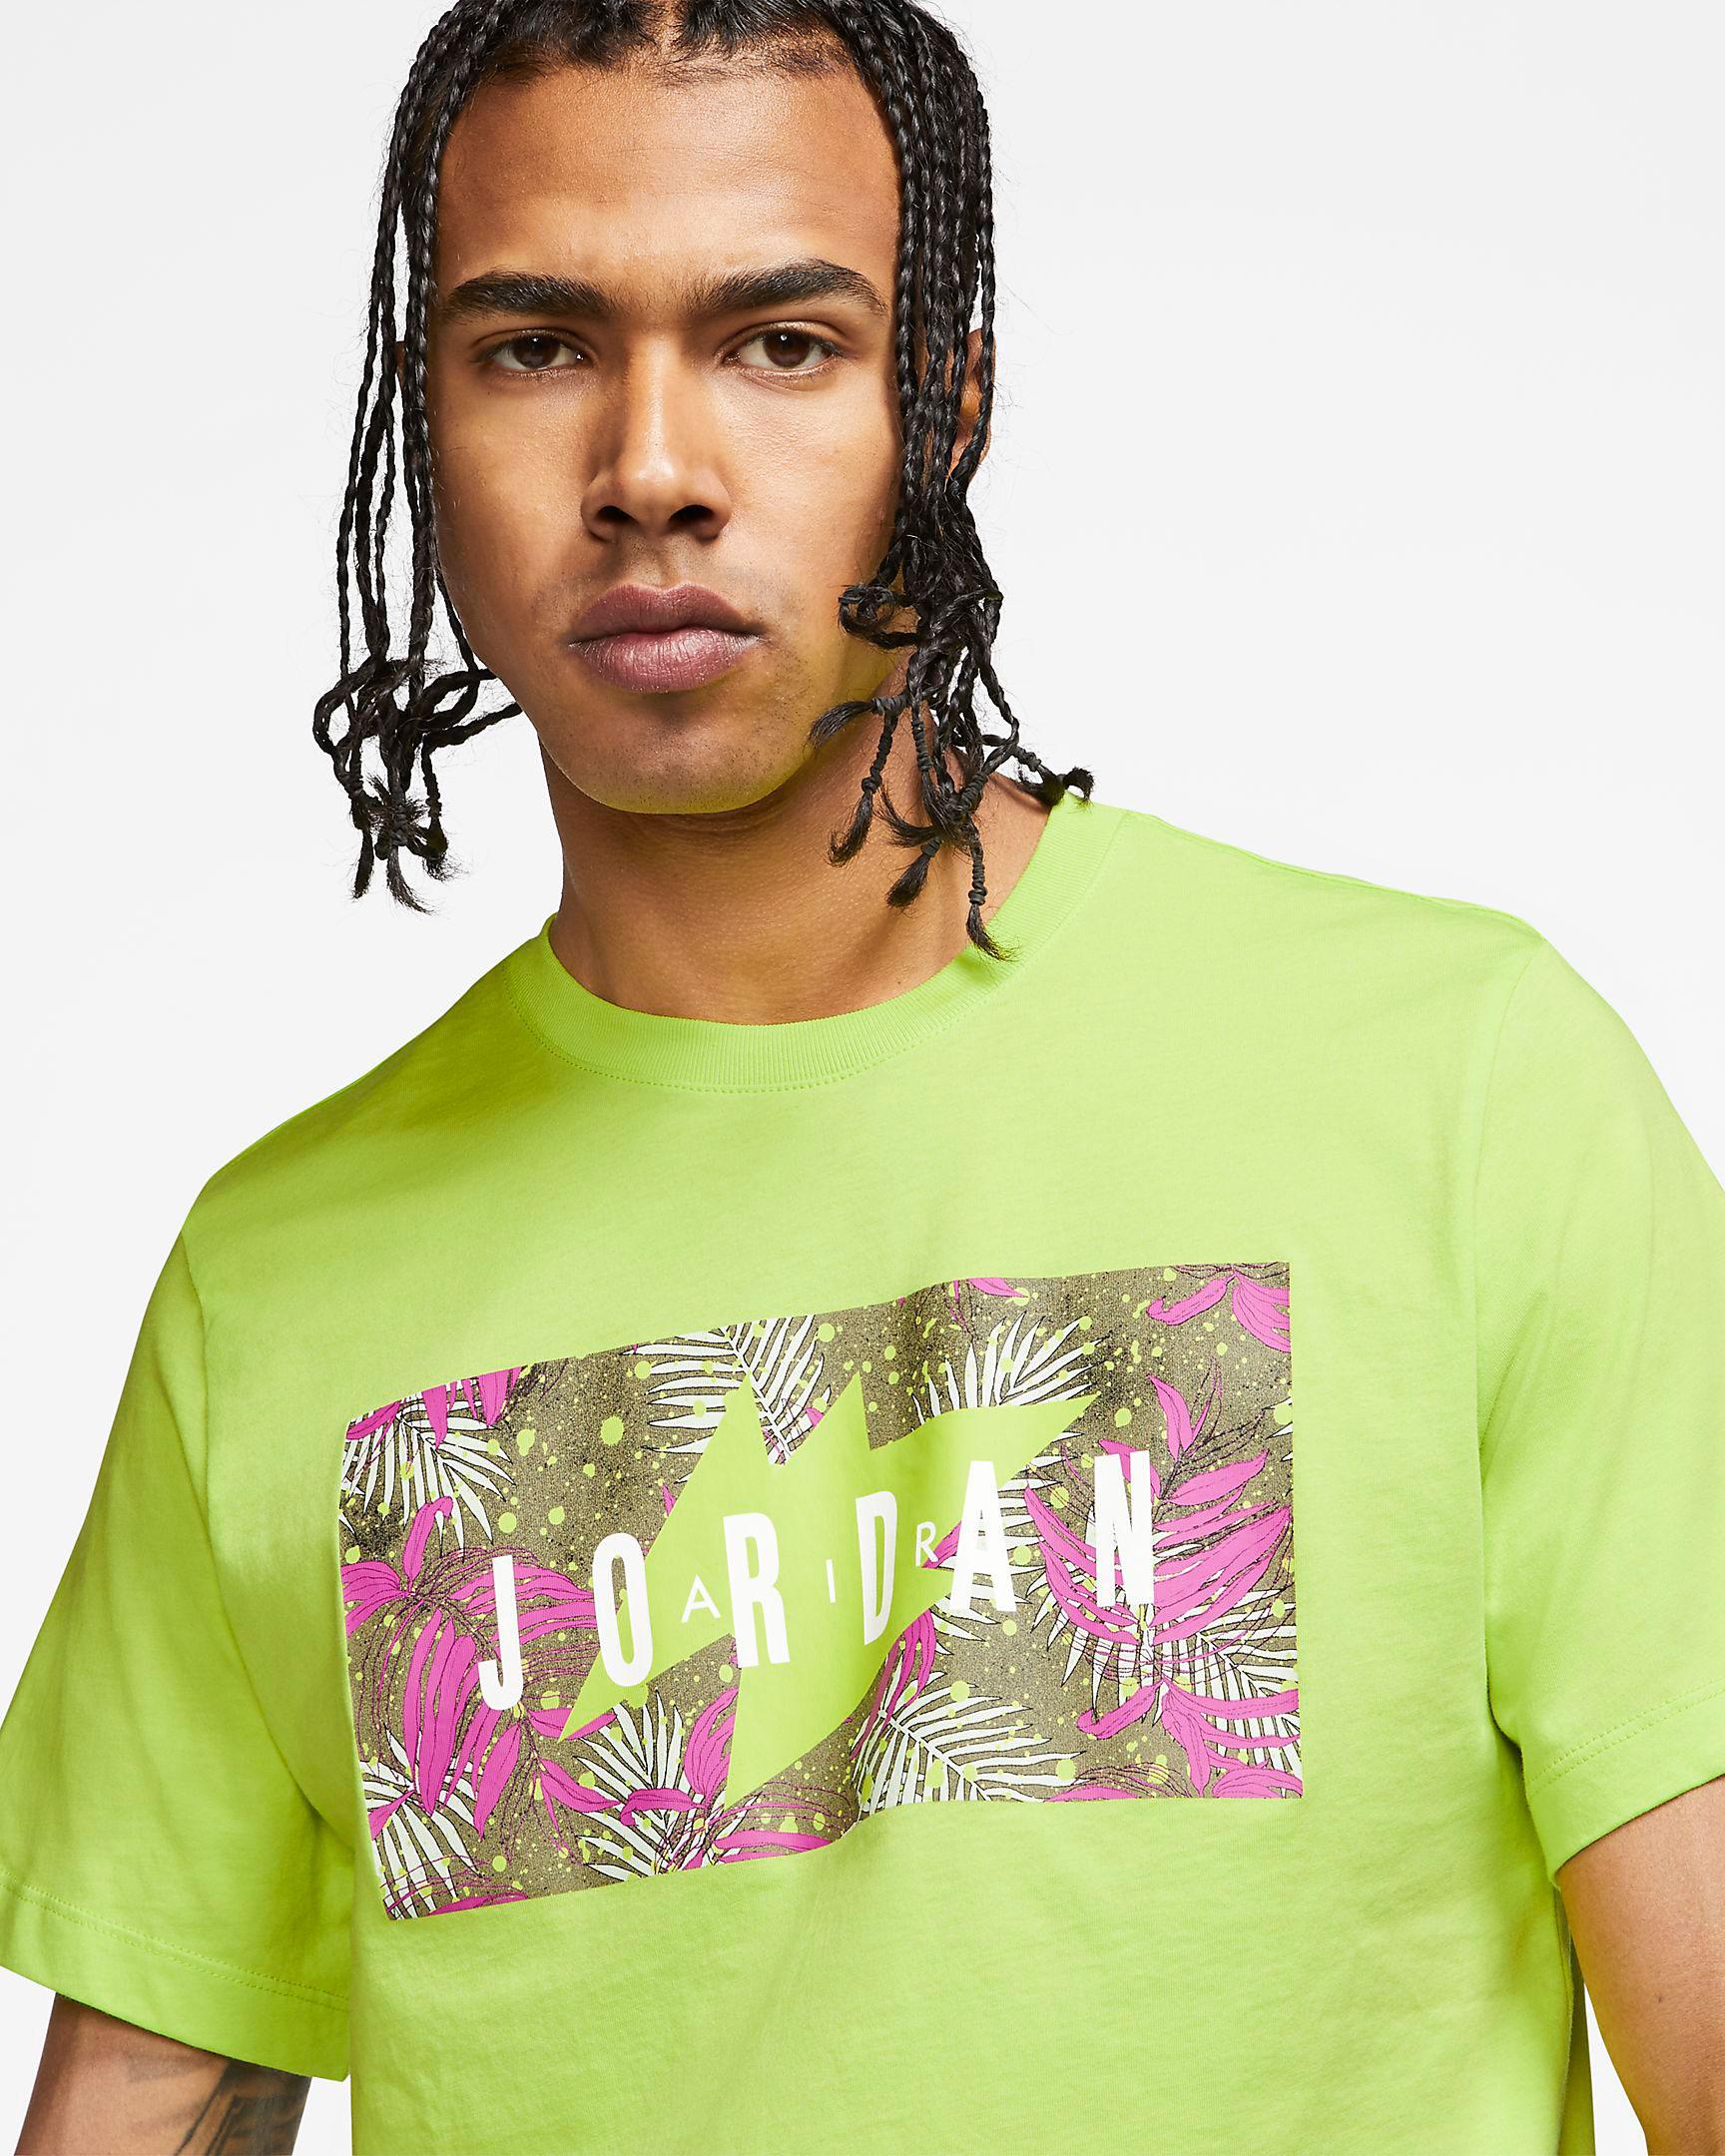 jordan-5-bel-air-alternate-matching-t-shirt